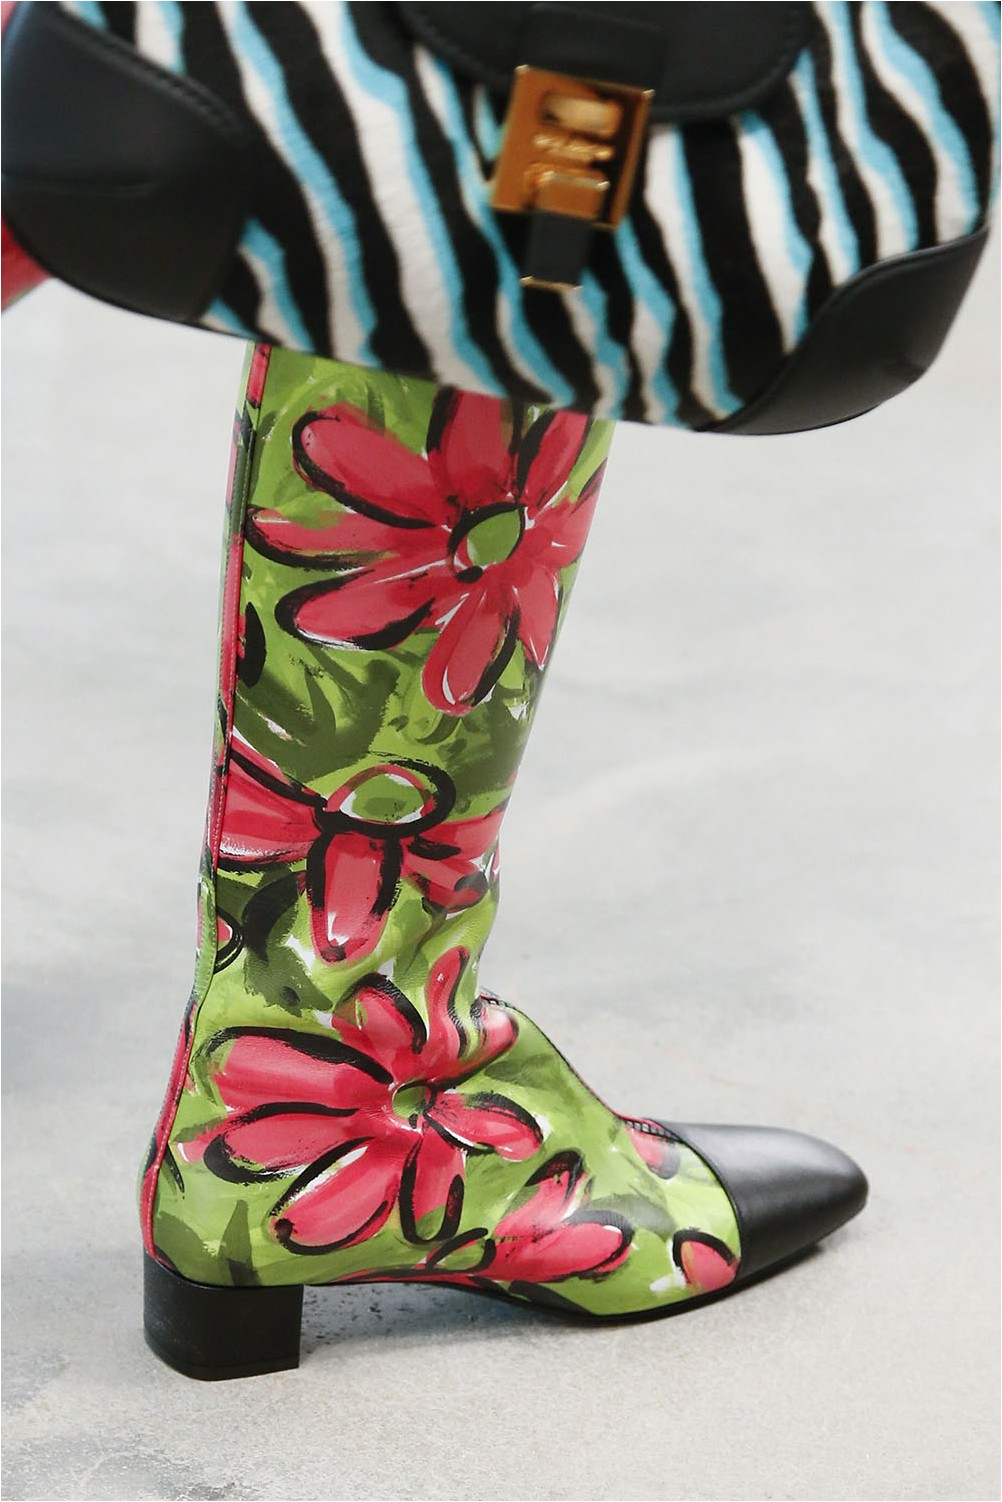 Floral print by Michael Kors